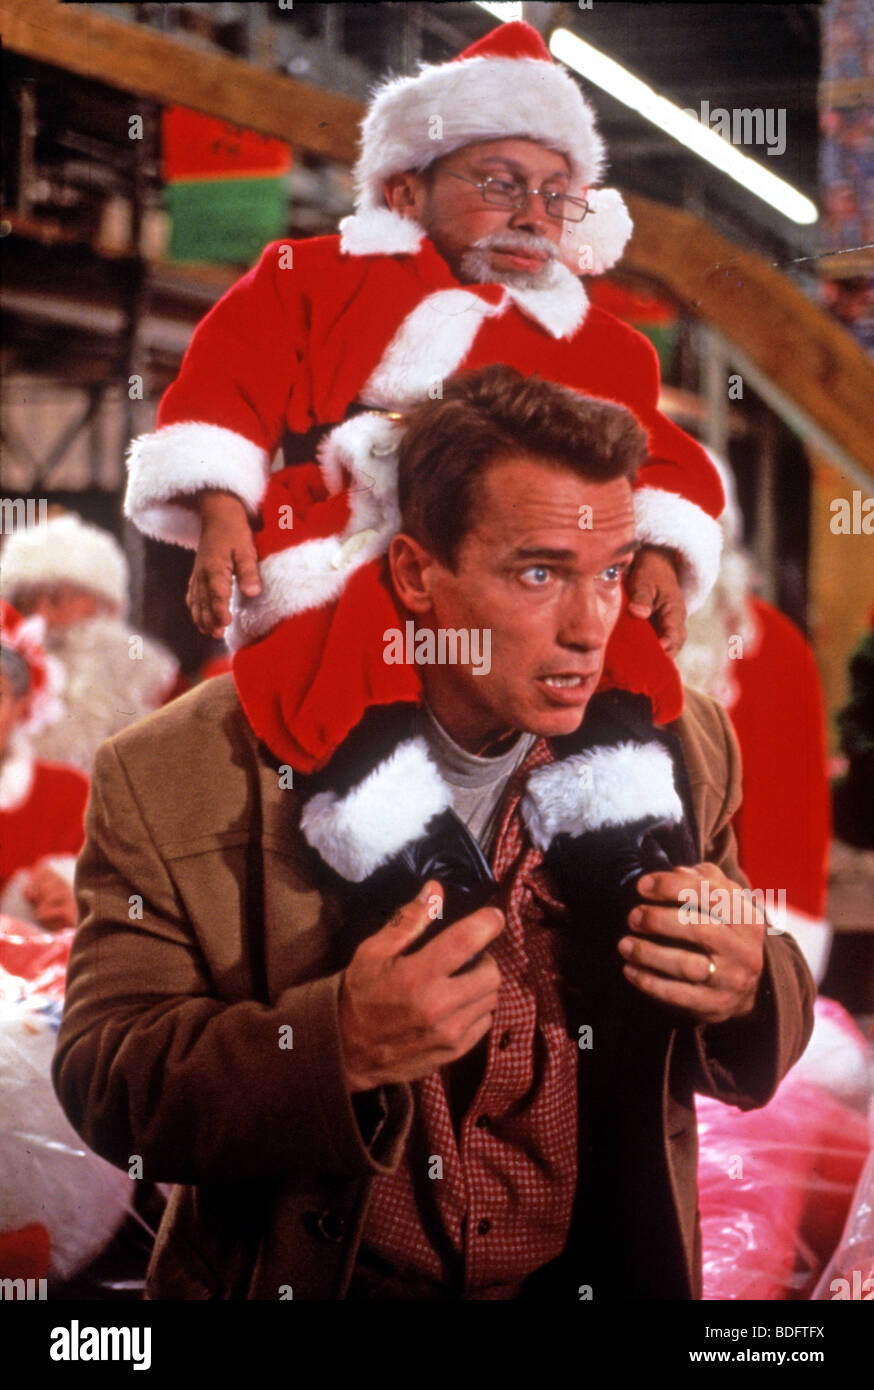 Jingle All The Way 1996 Tcf Film With Arnold Schwarzenegger Stock Photo Alamy